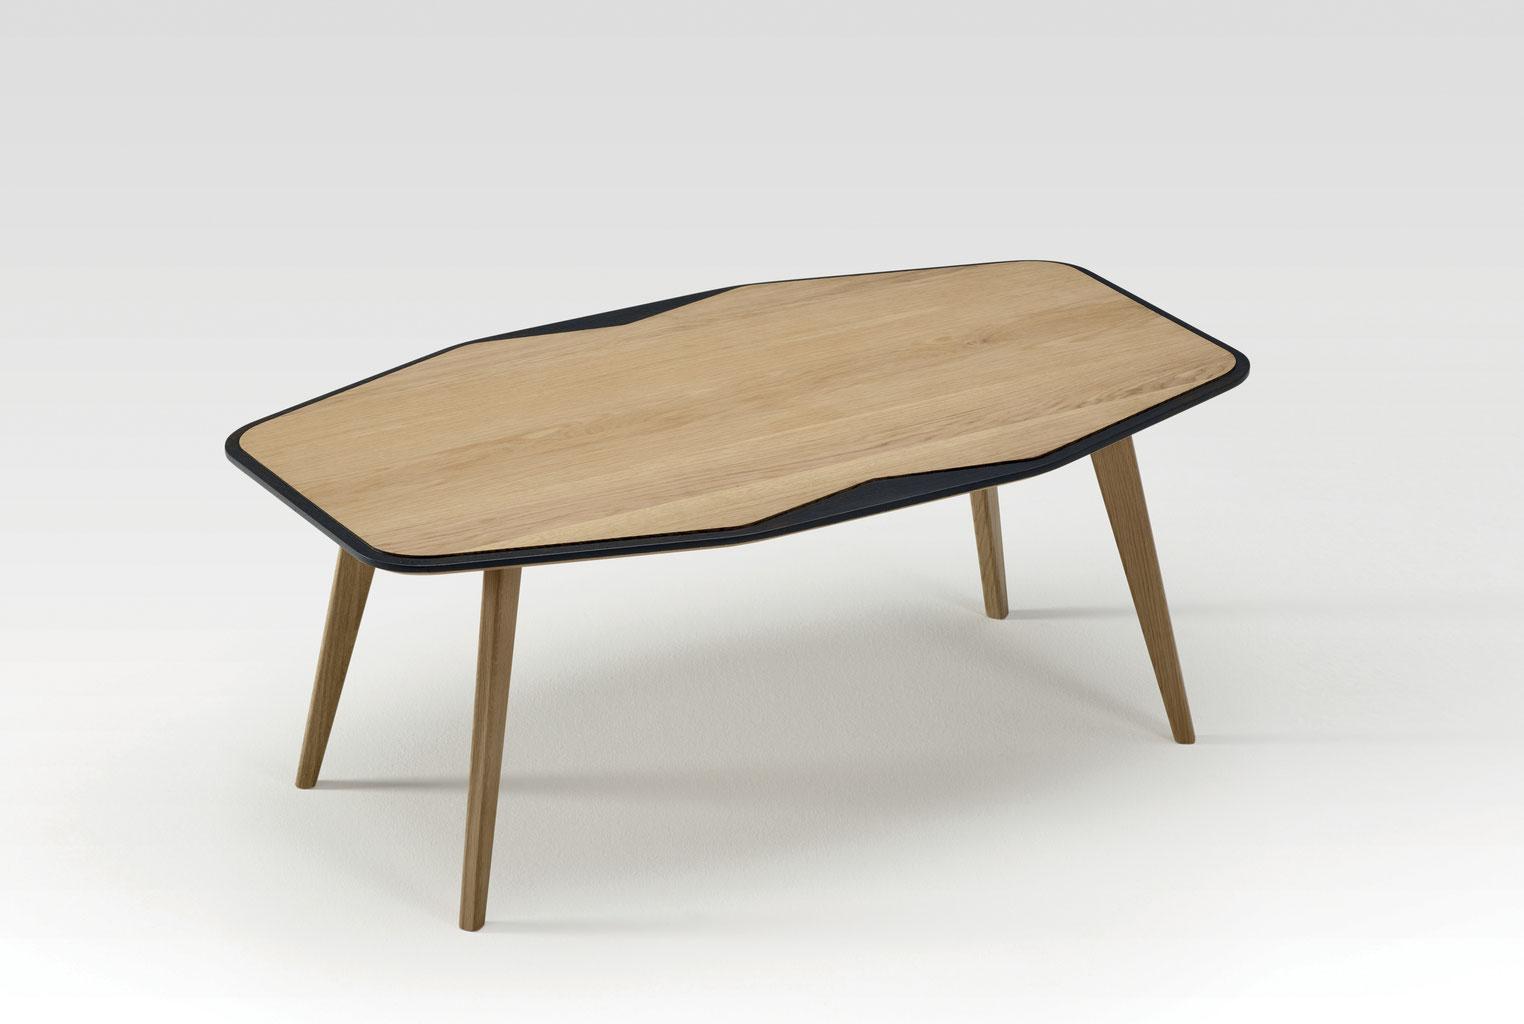 Table Basse F72 Collection Flo Julie Gaillard Design